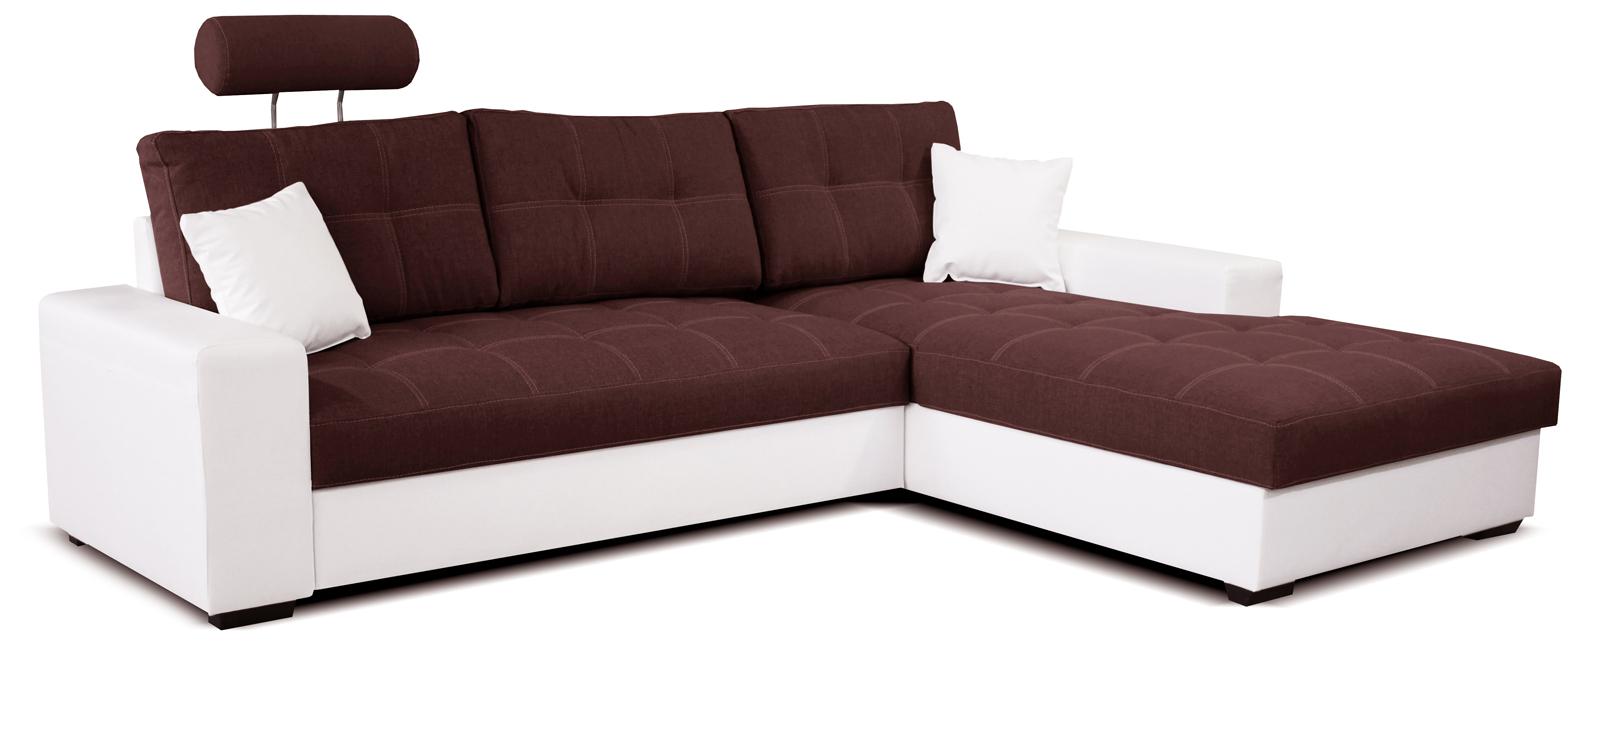 Rohová sedací souprava - Po-Sed - Corato 2F+L (bordó + bílá) (P)